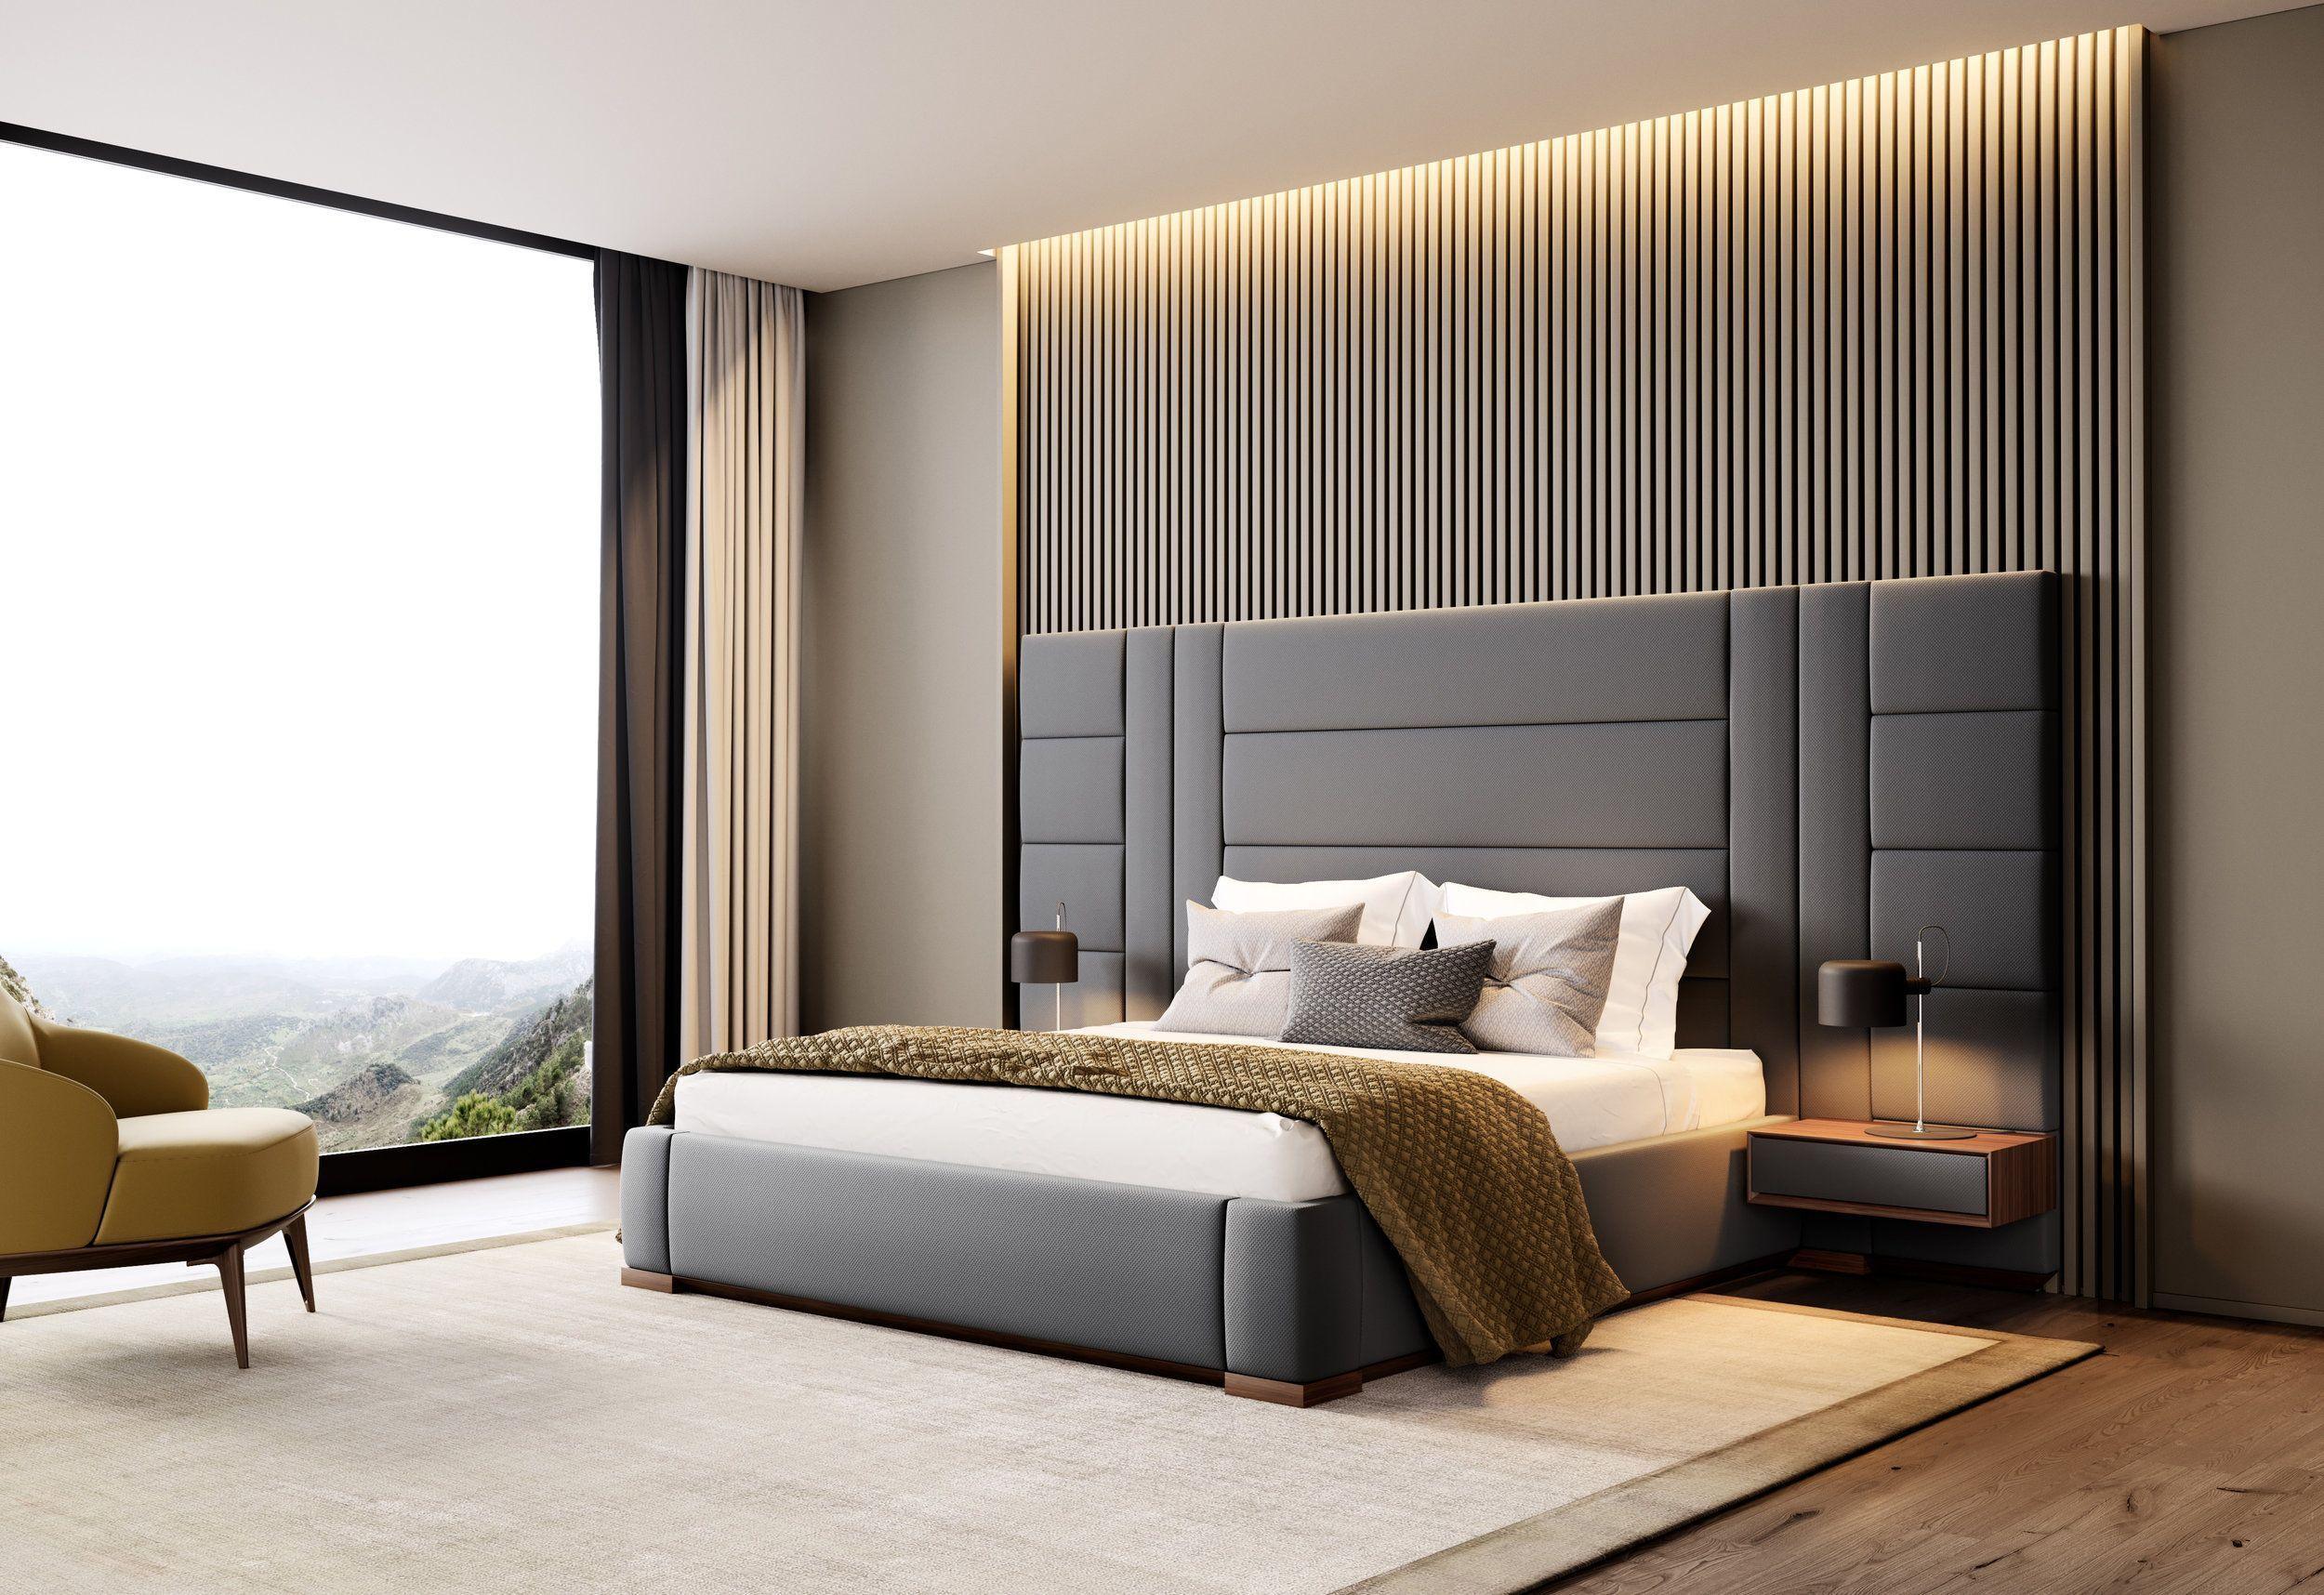 Amazing Bedroom Design Ideas Simple Modern Minimalist Modern Bedroom Design Bedroom Interior Luxurious Bedrooms